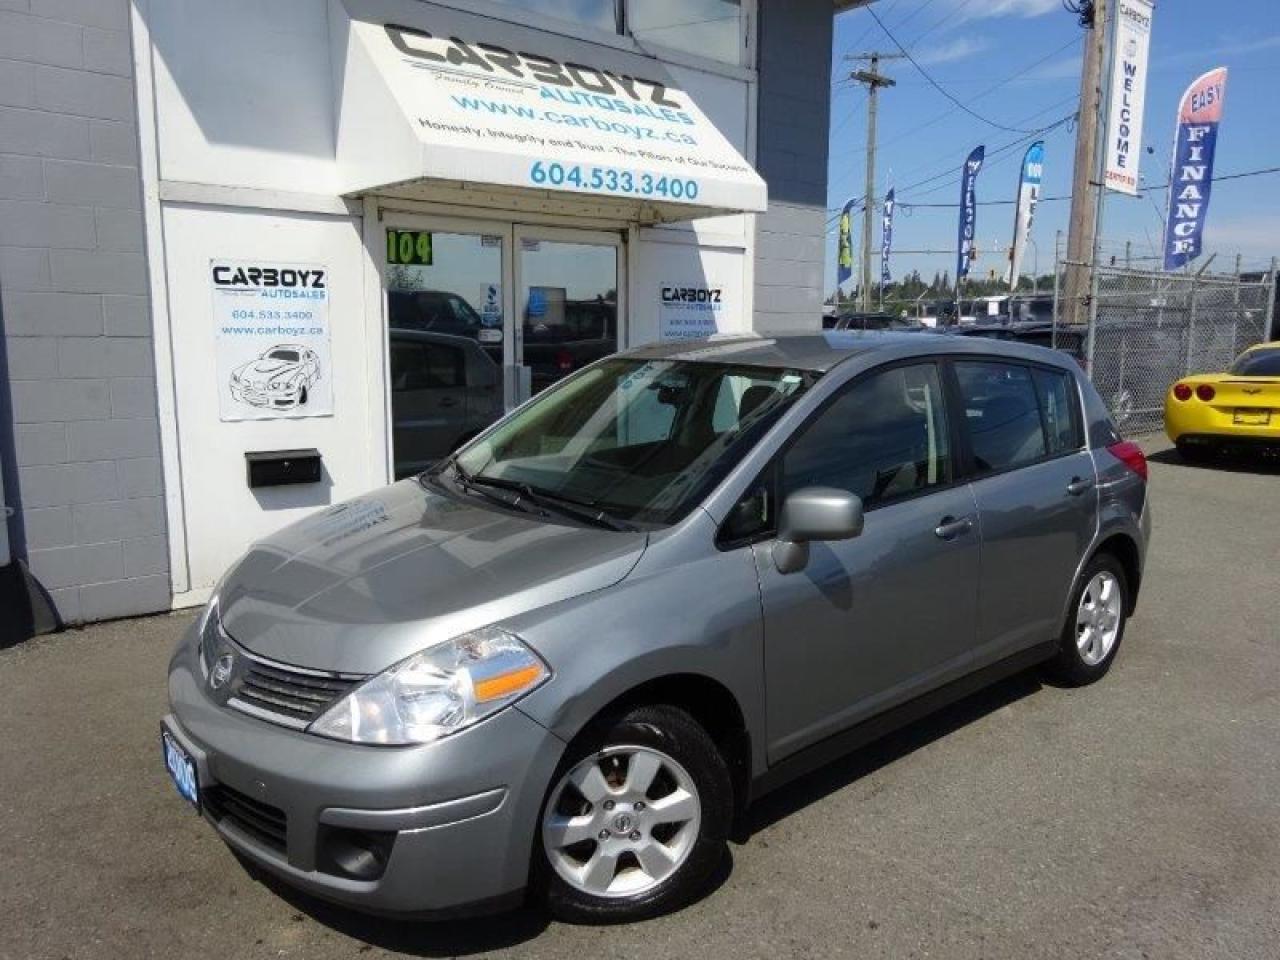 2009 Nissan Versa SL Hatchback, Automatic, Bluetooth, 113, 082 Kms